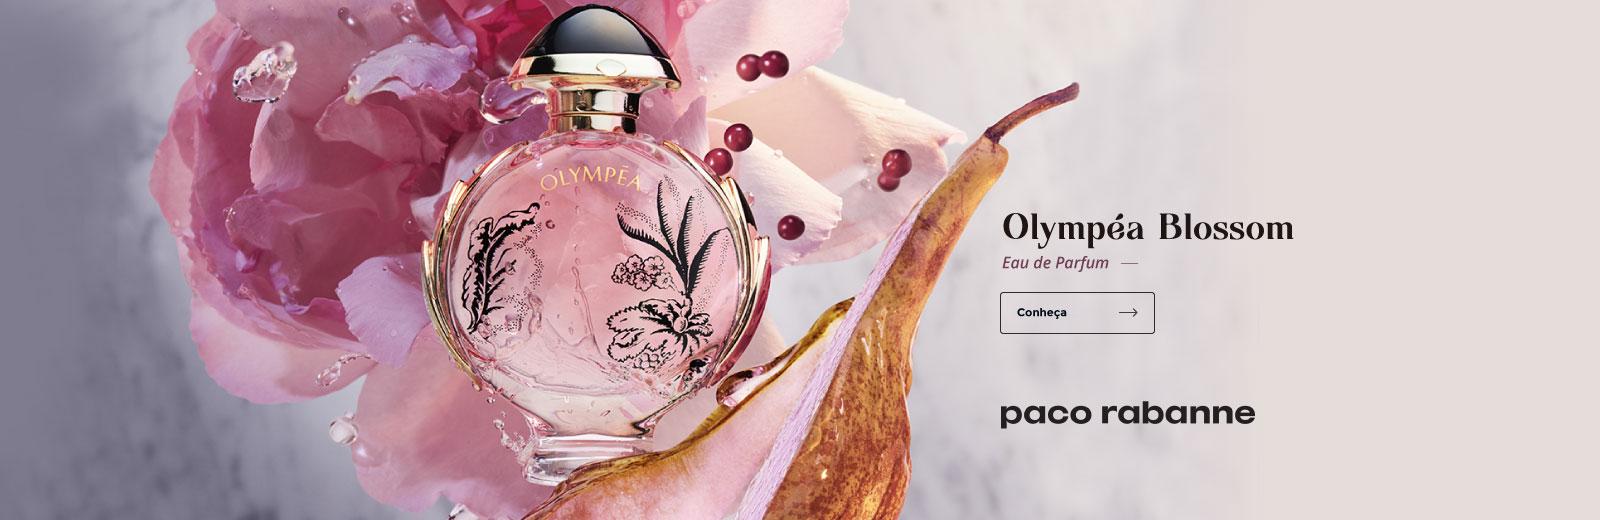 Olympea Blossom